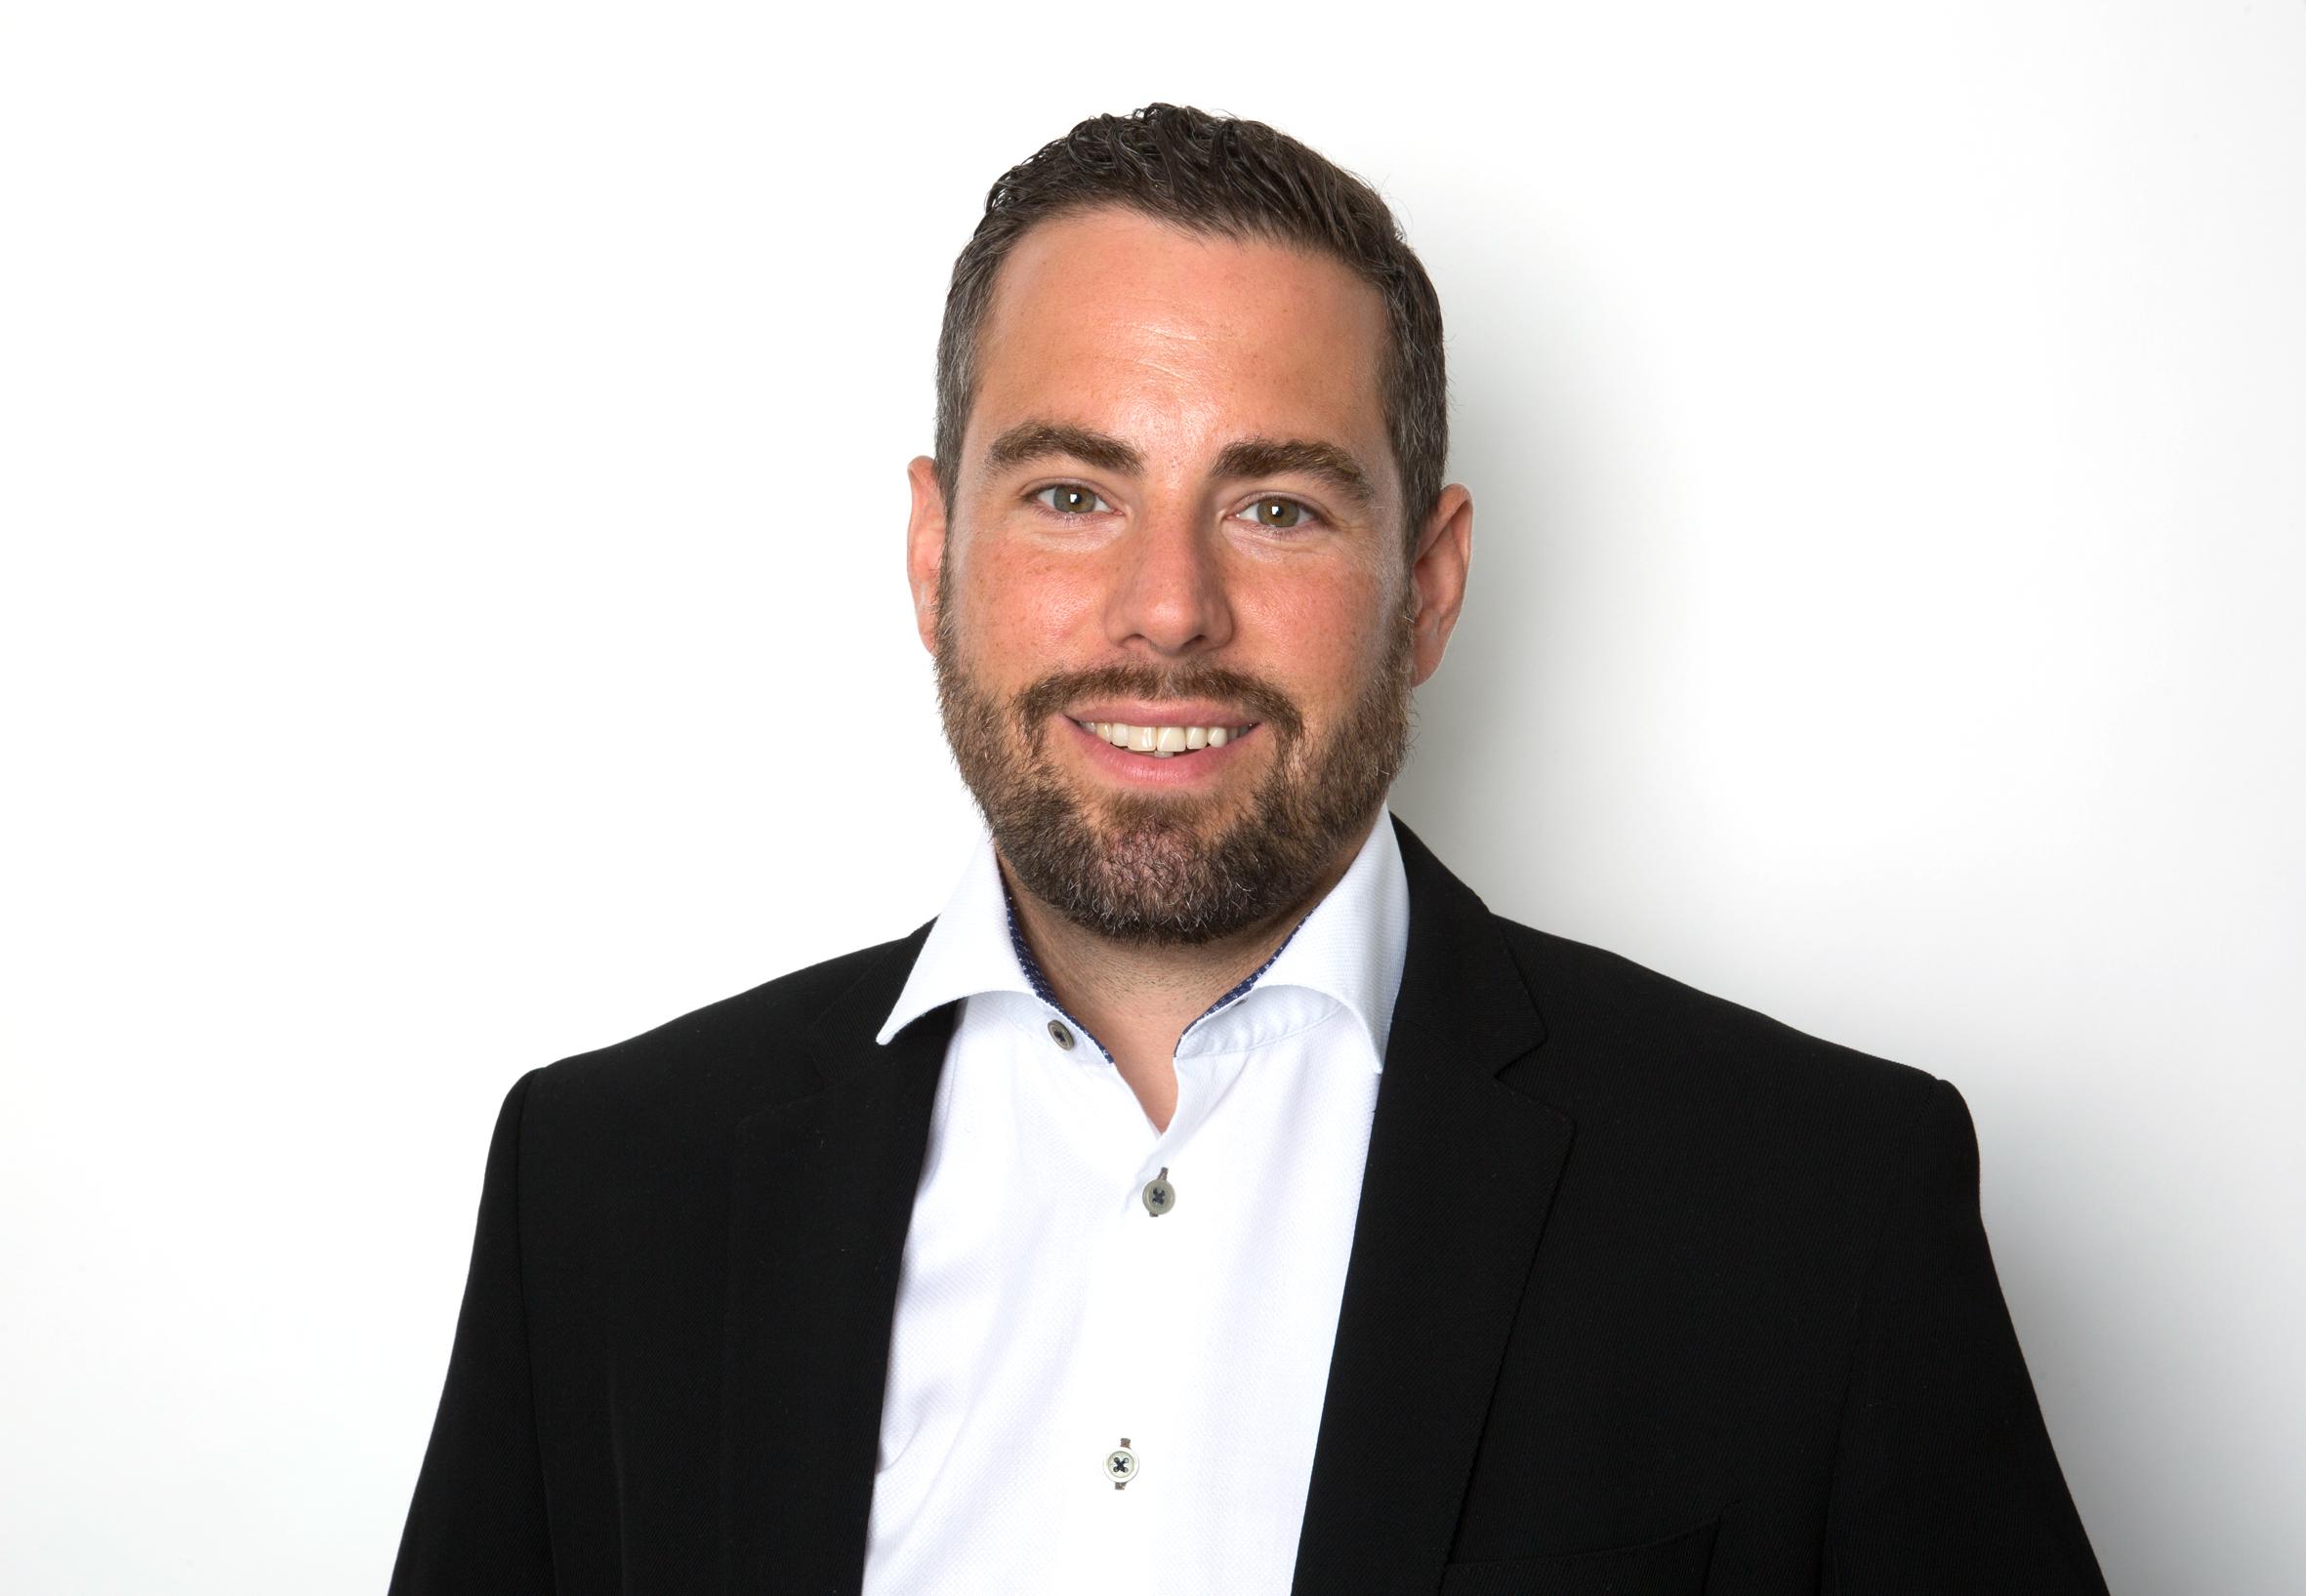 Jürgen Dallinger